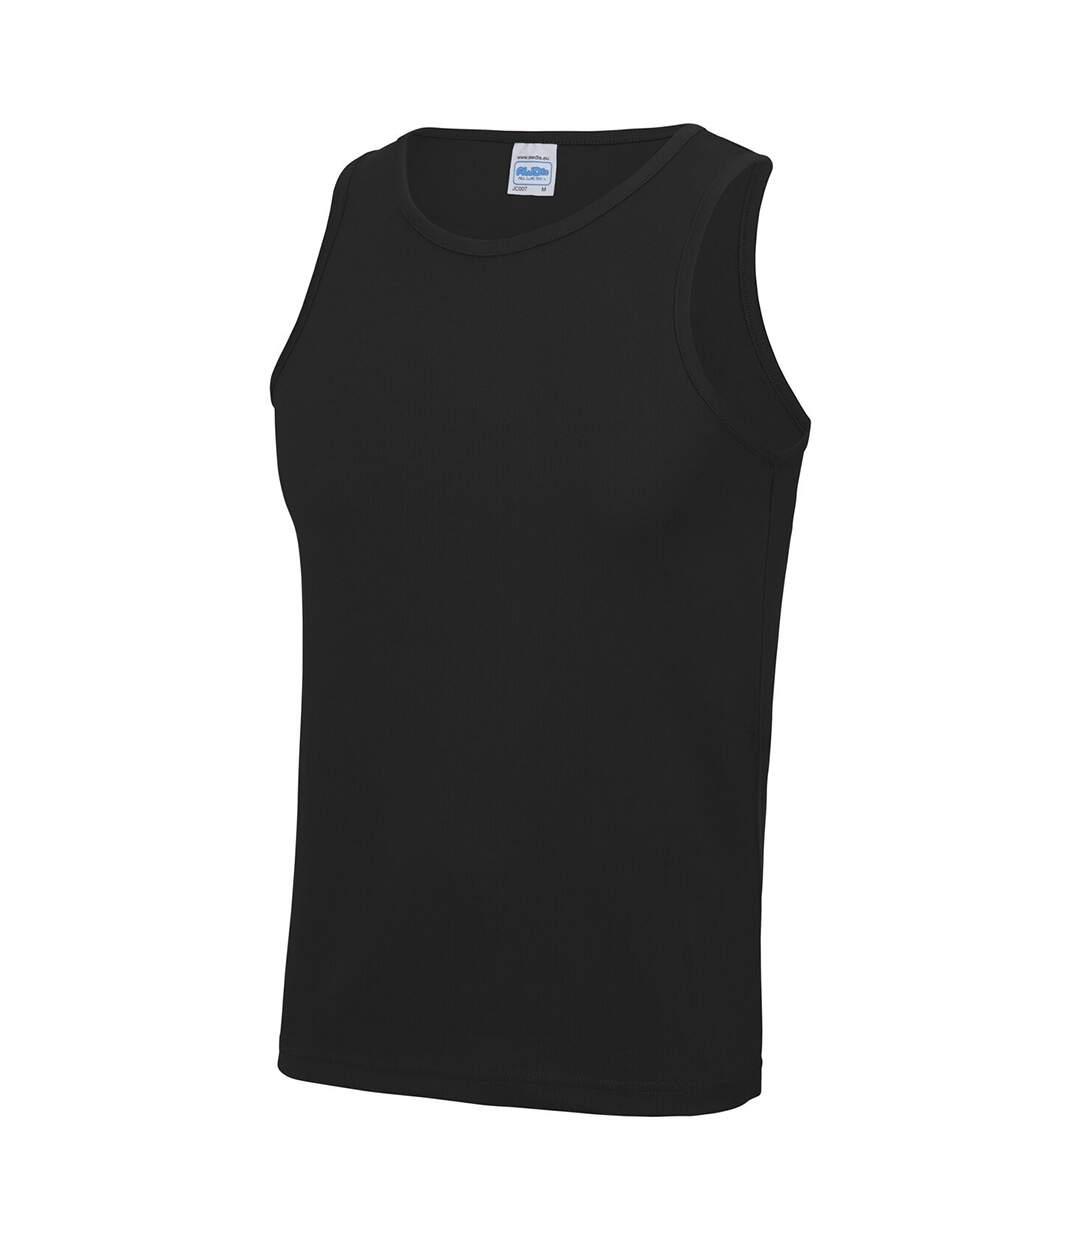 Just Cool Mens Sports Gym Plain Tank / Vest Top (Orange Crush) - UTRW687